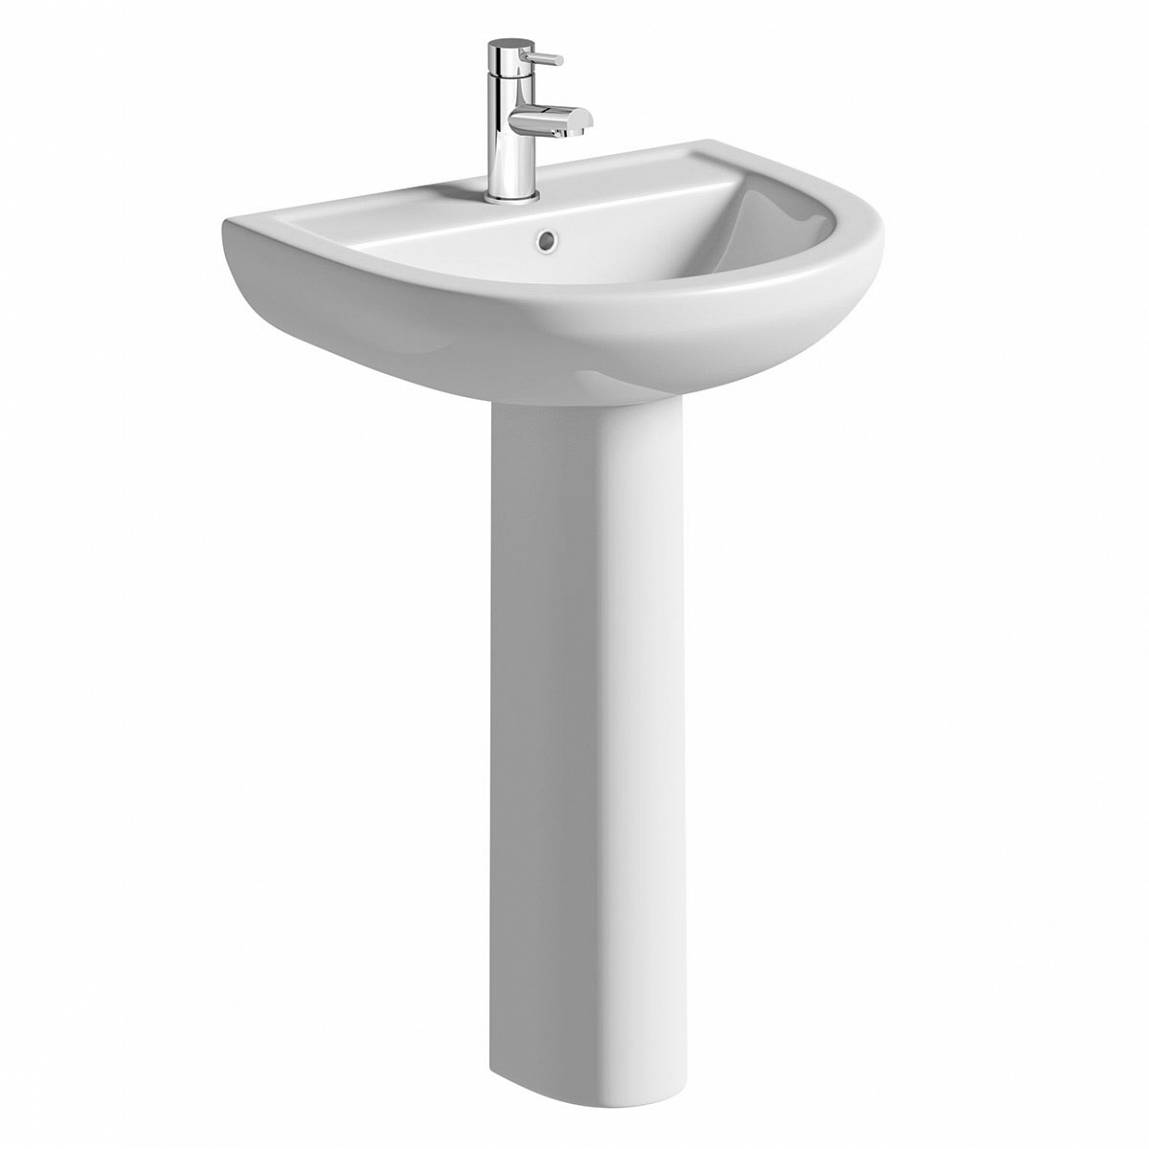 Image of Como Basin & Pedestal Special Offer